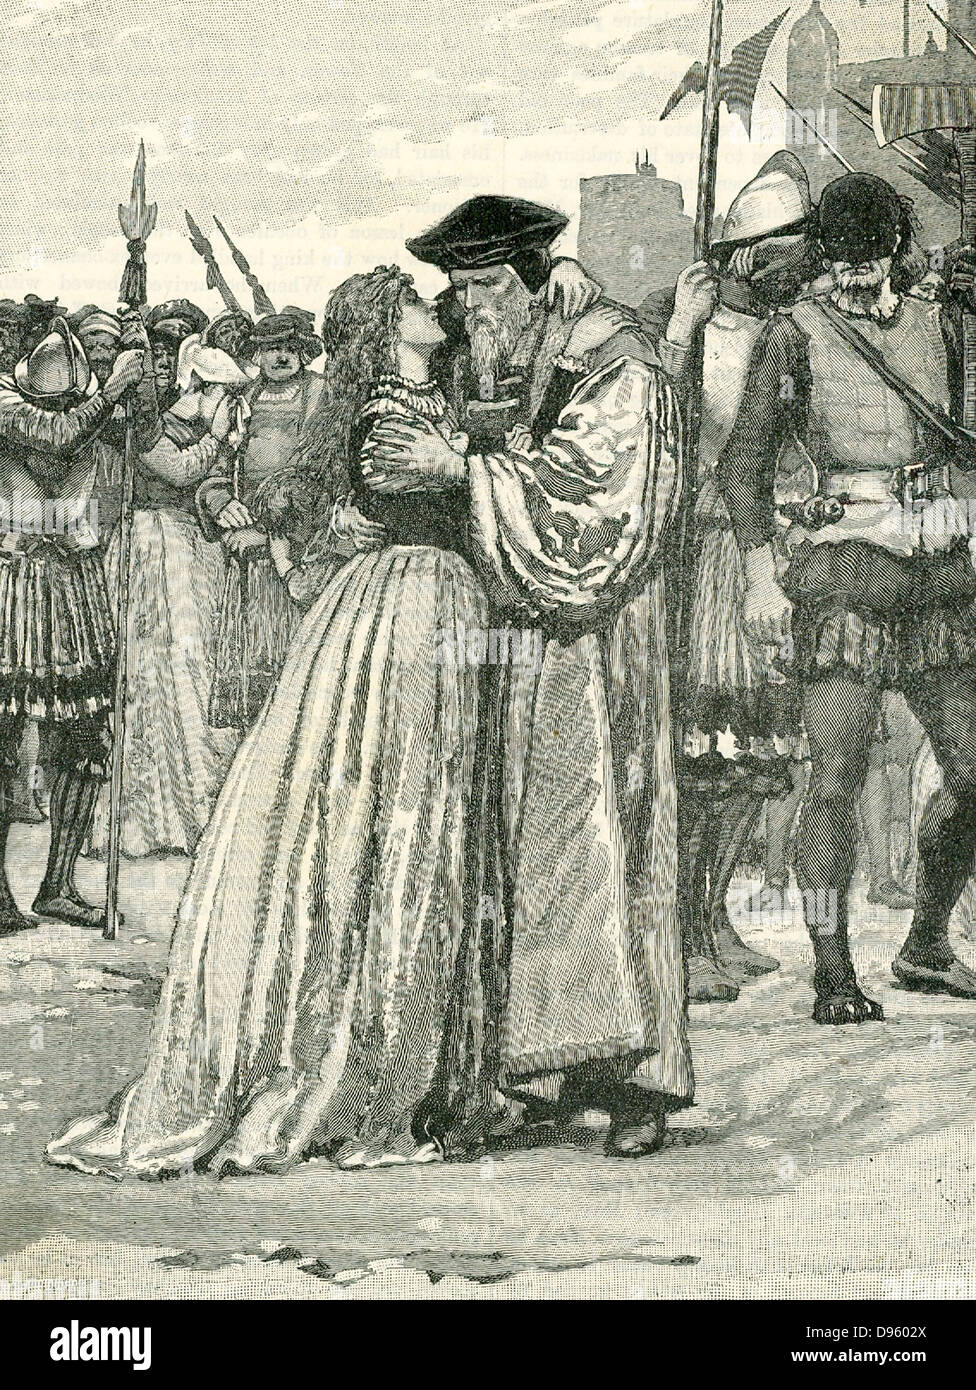 Thomas More (1478-1535) English scholar and statesman. Author of 'Utopia', friend of Erasmus. Lord Chancellor - Stock Image